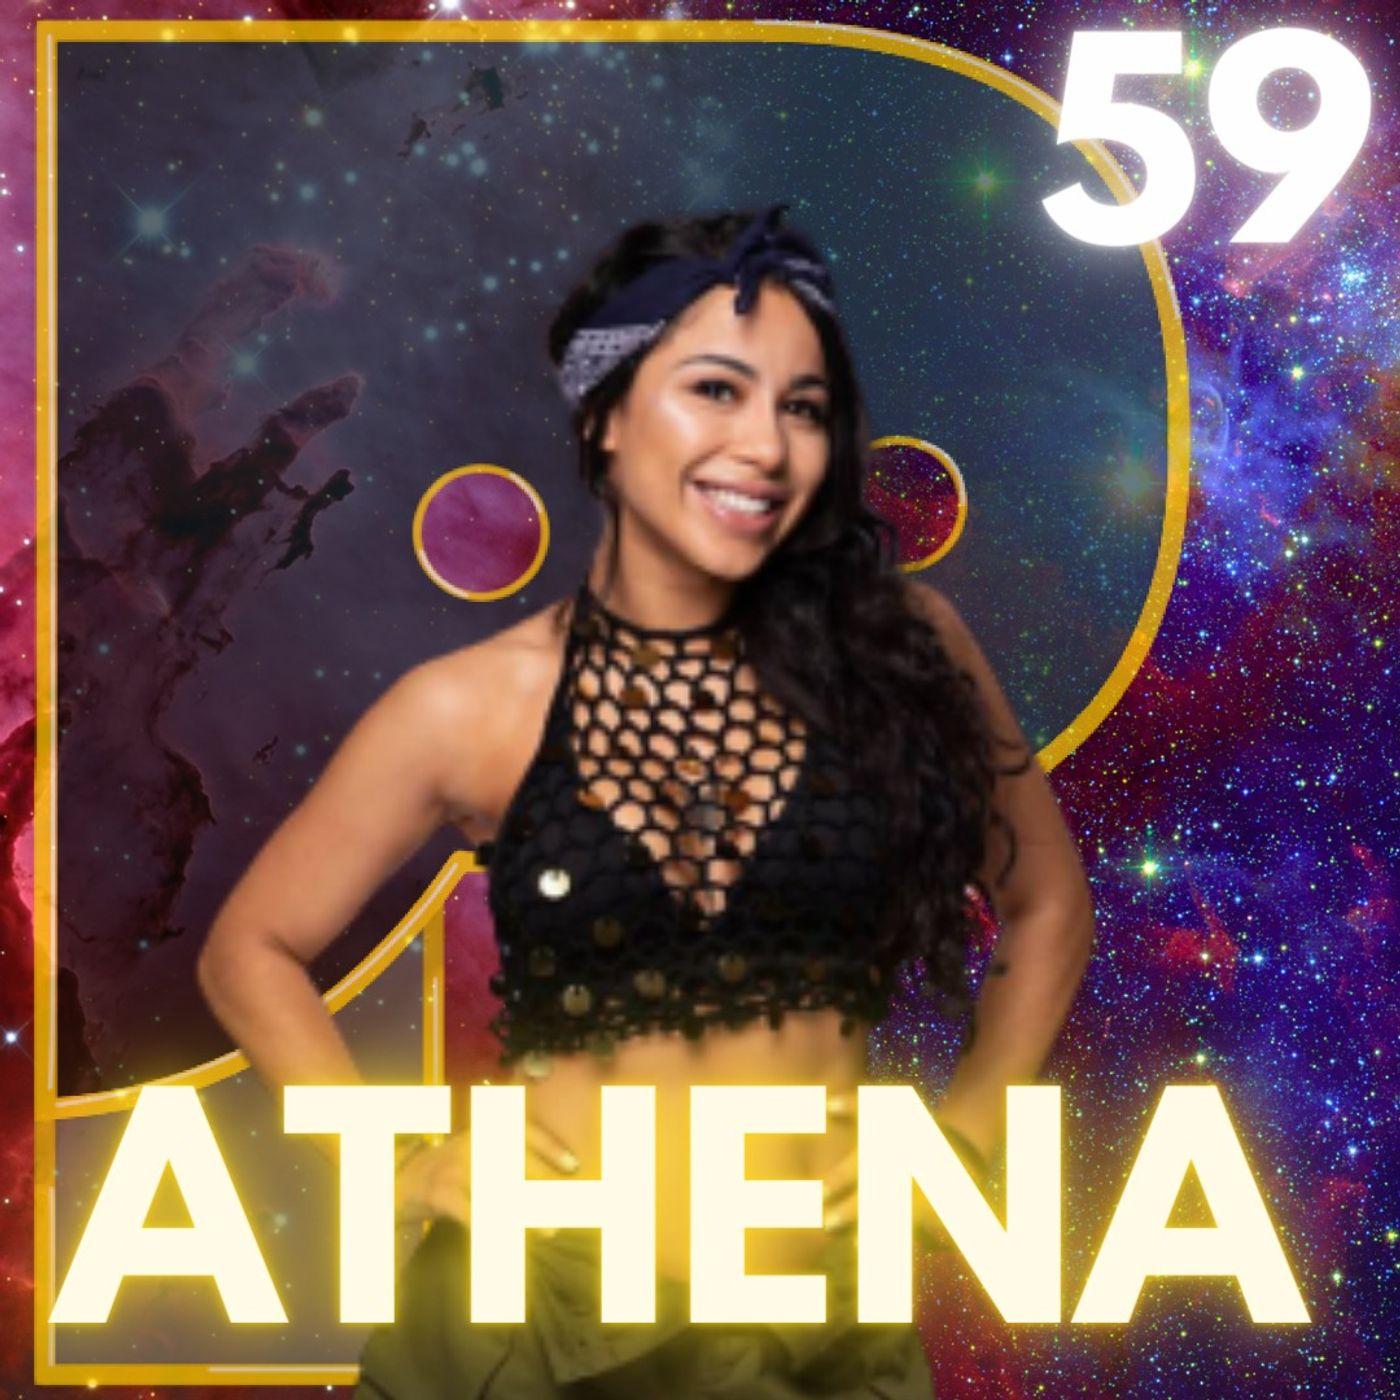 OnlyFlavaFans.com with Athena Angleou